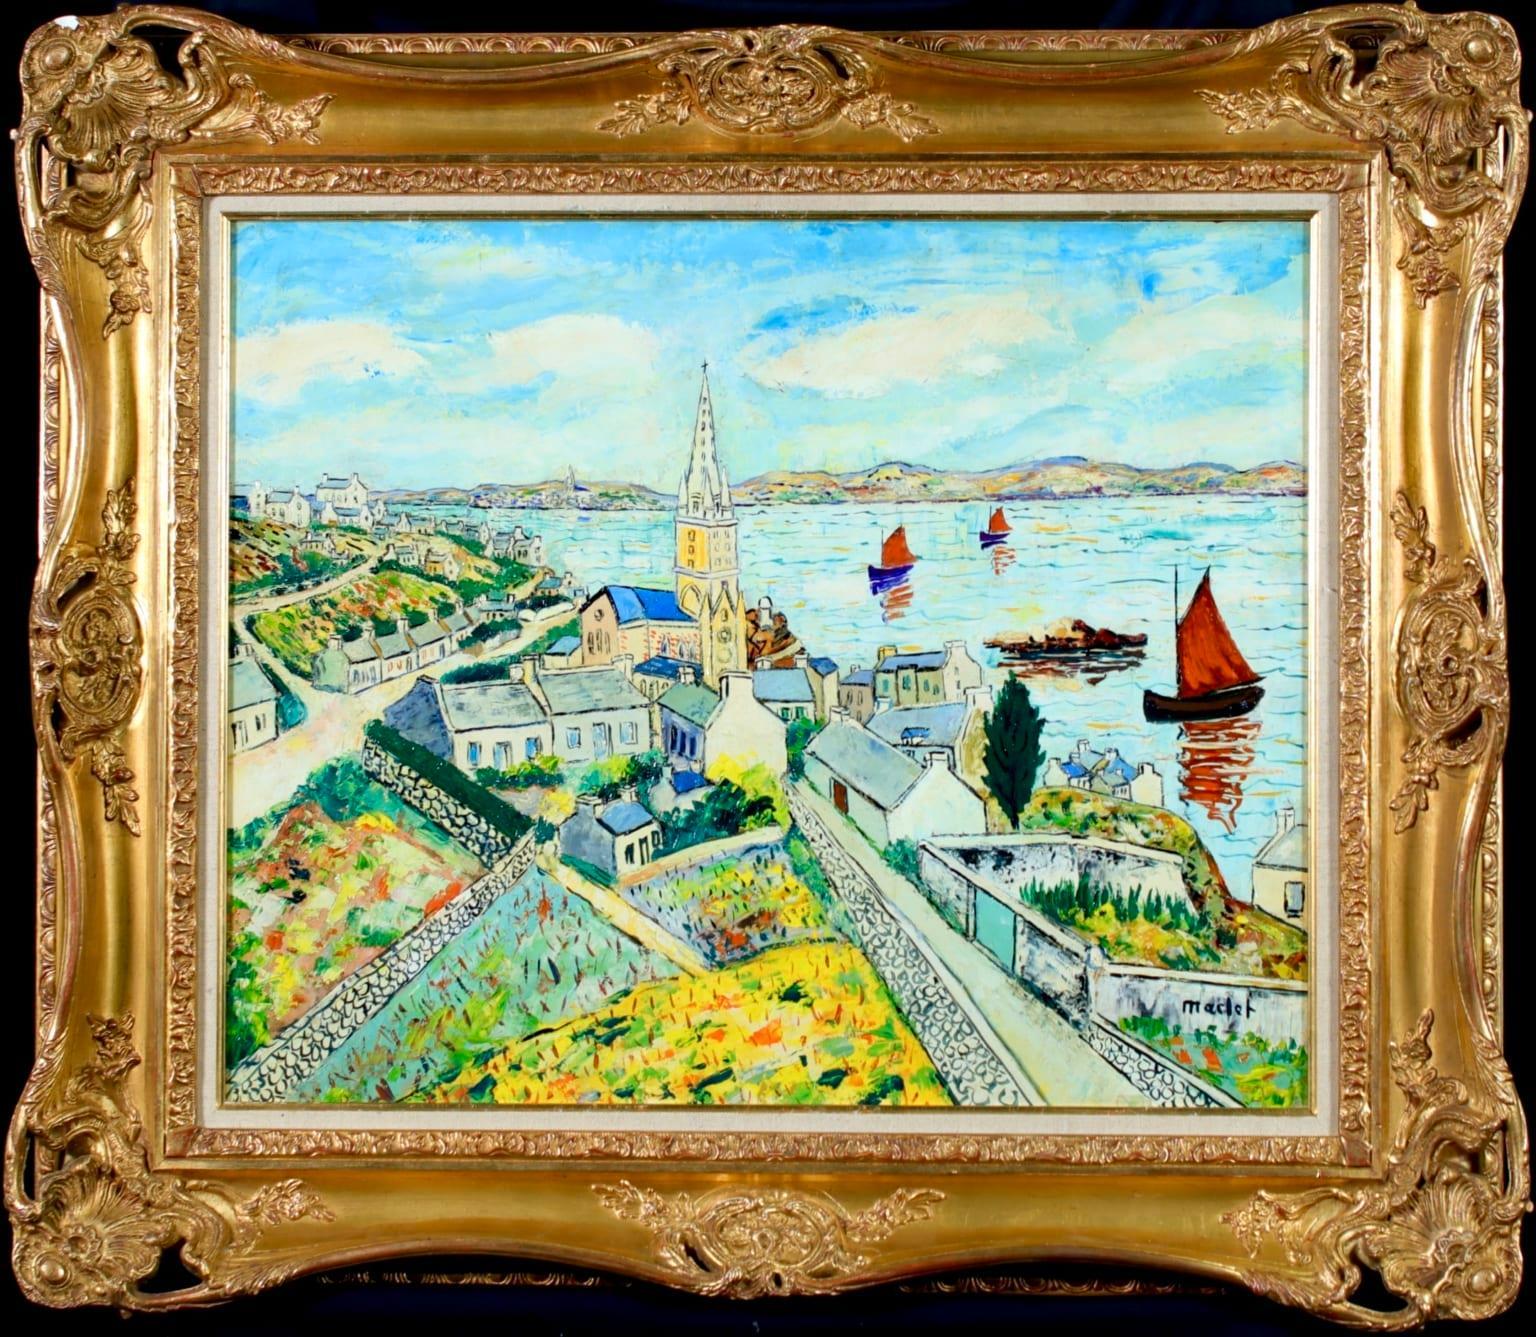 Ile de Batz - Post-Impressionist Oil, Boats at Sea Landscape by Elisee Maclet